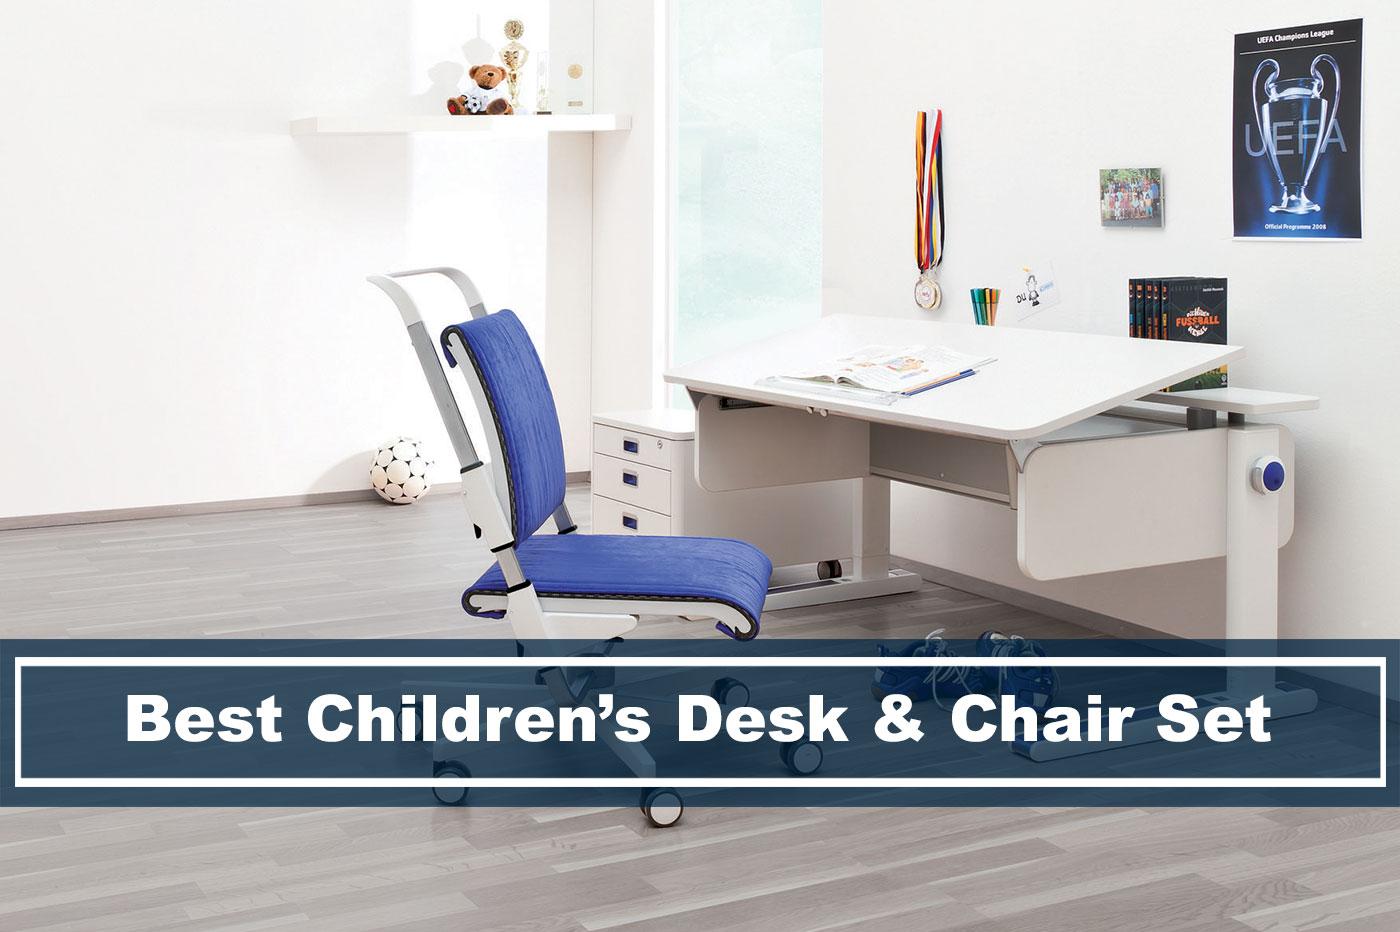 desk or chair gym bench press 8 best ergonomic children s and set in 2019 buyer guide adjustable kids